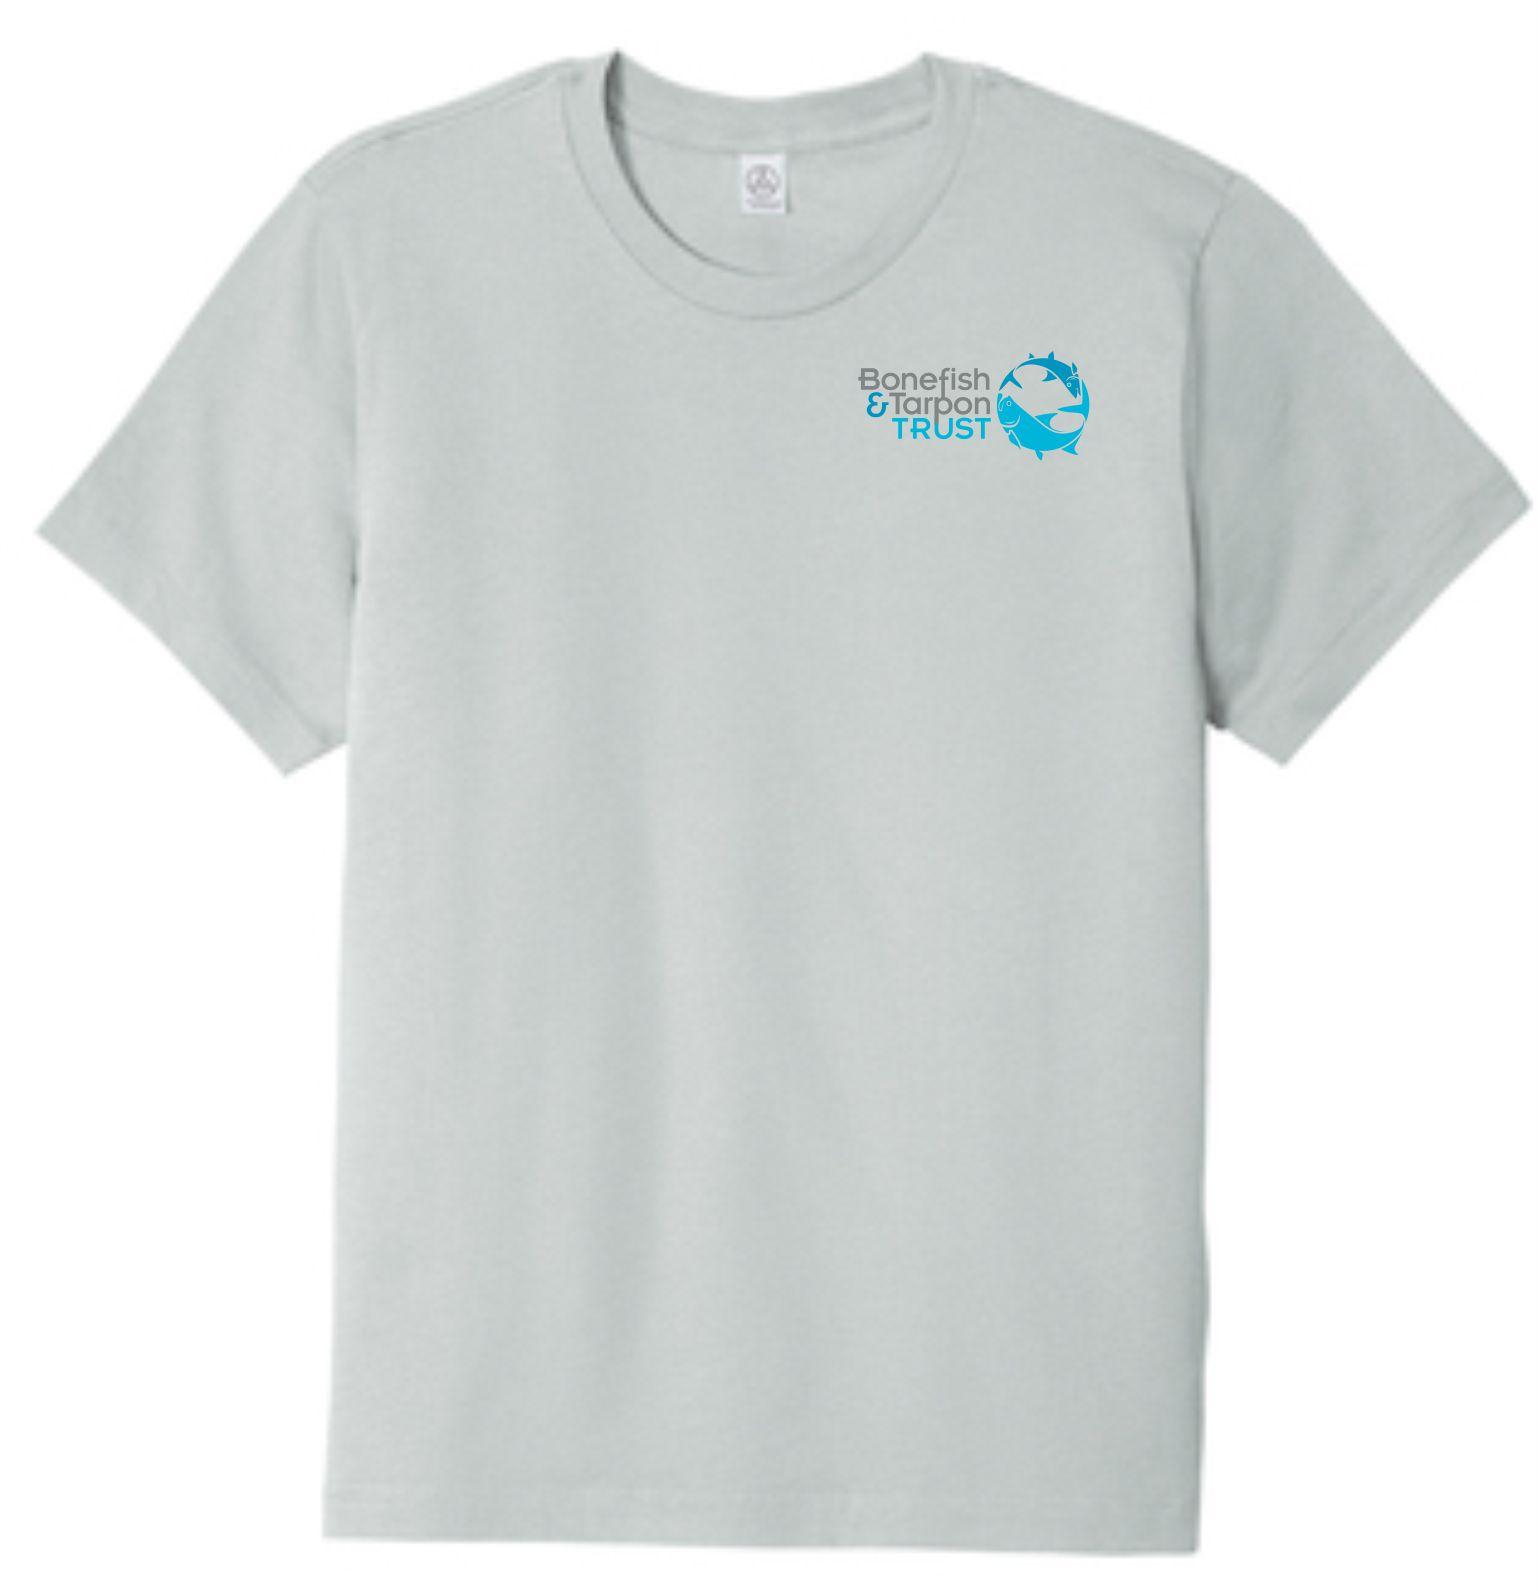 Mangrove Bone T-Shirt - front.jpg